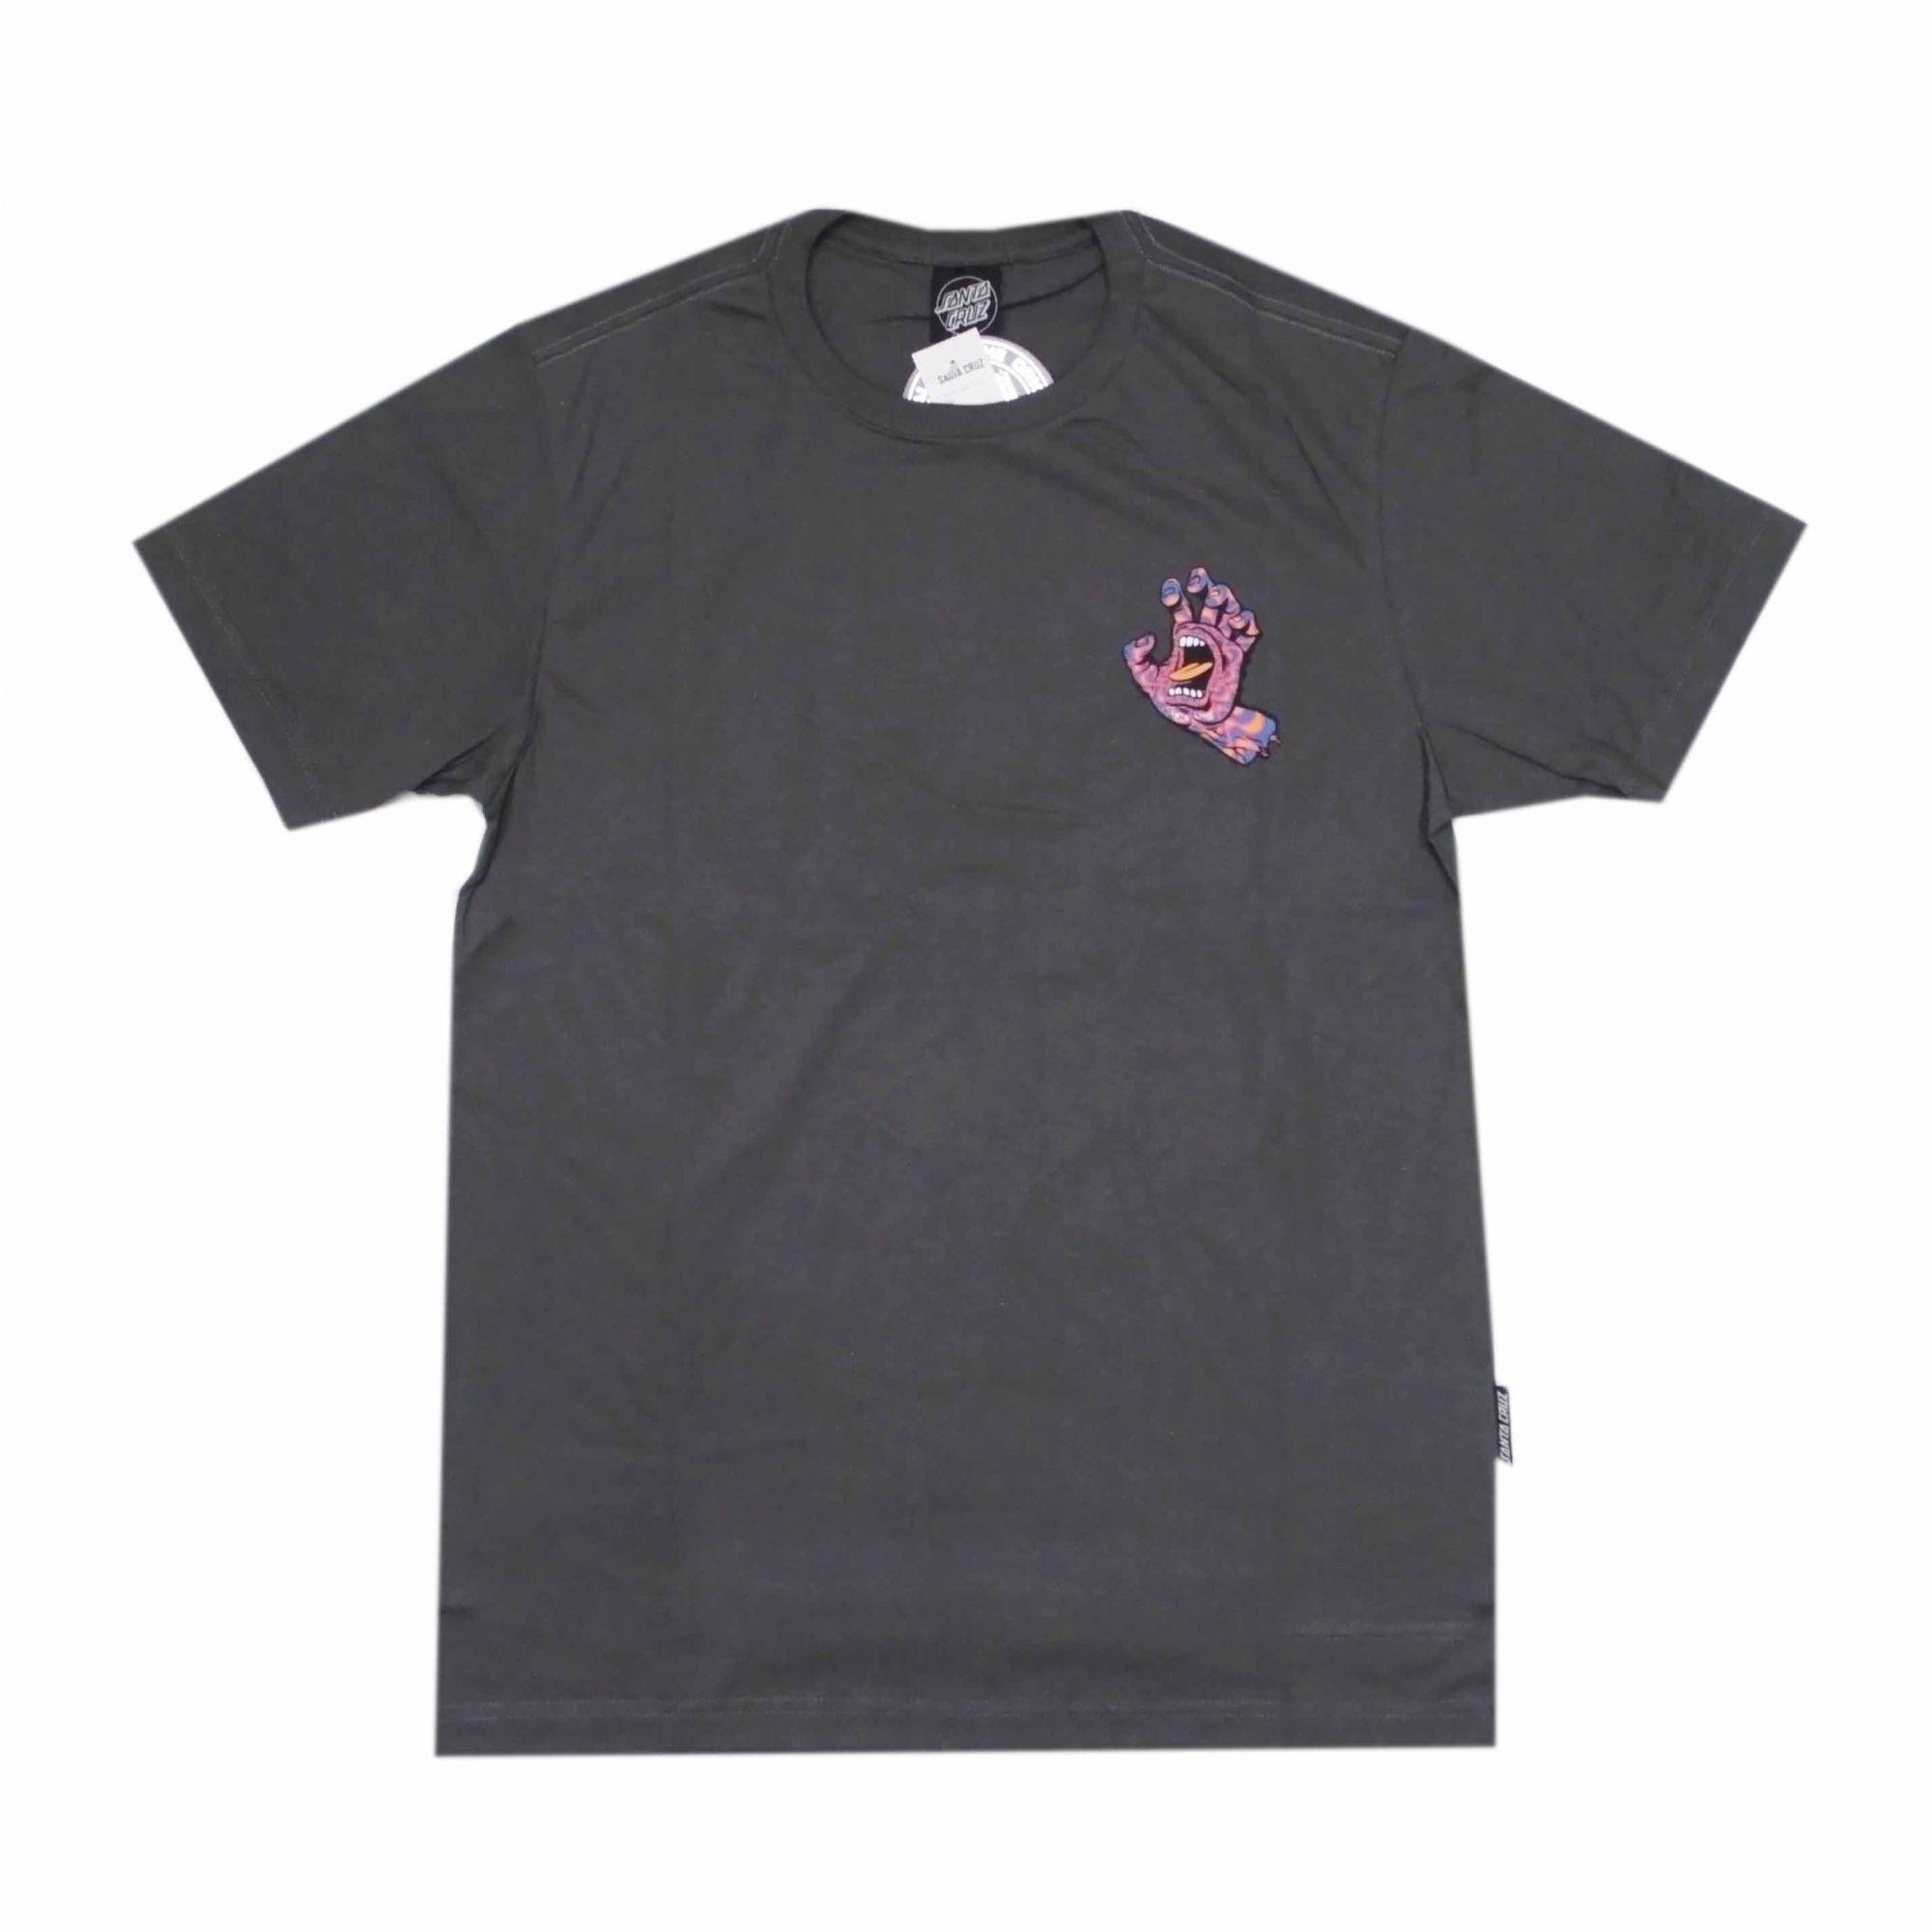 Camiseta Santa Cruz Kaleido Hand Cinza Chumbo